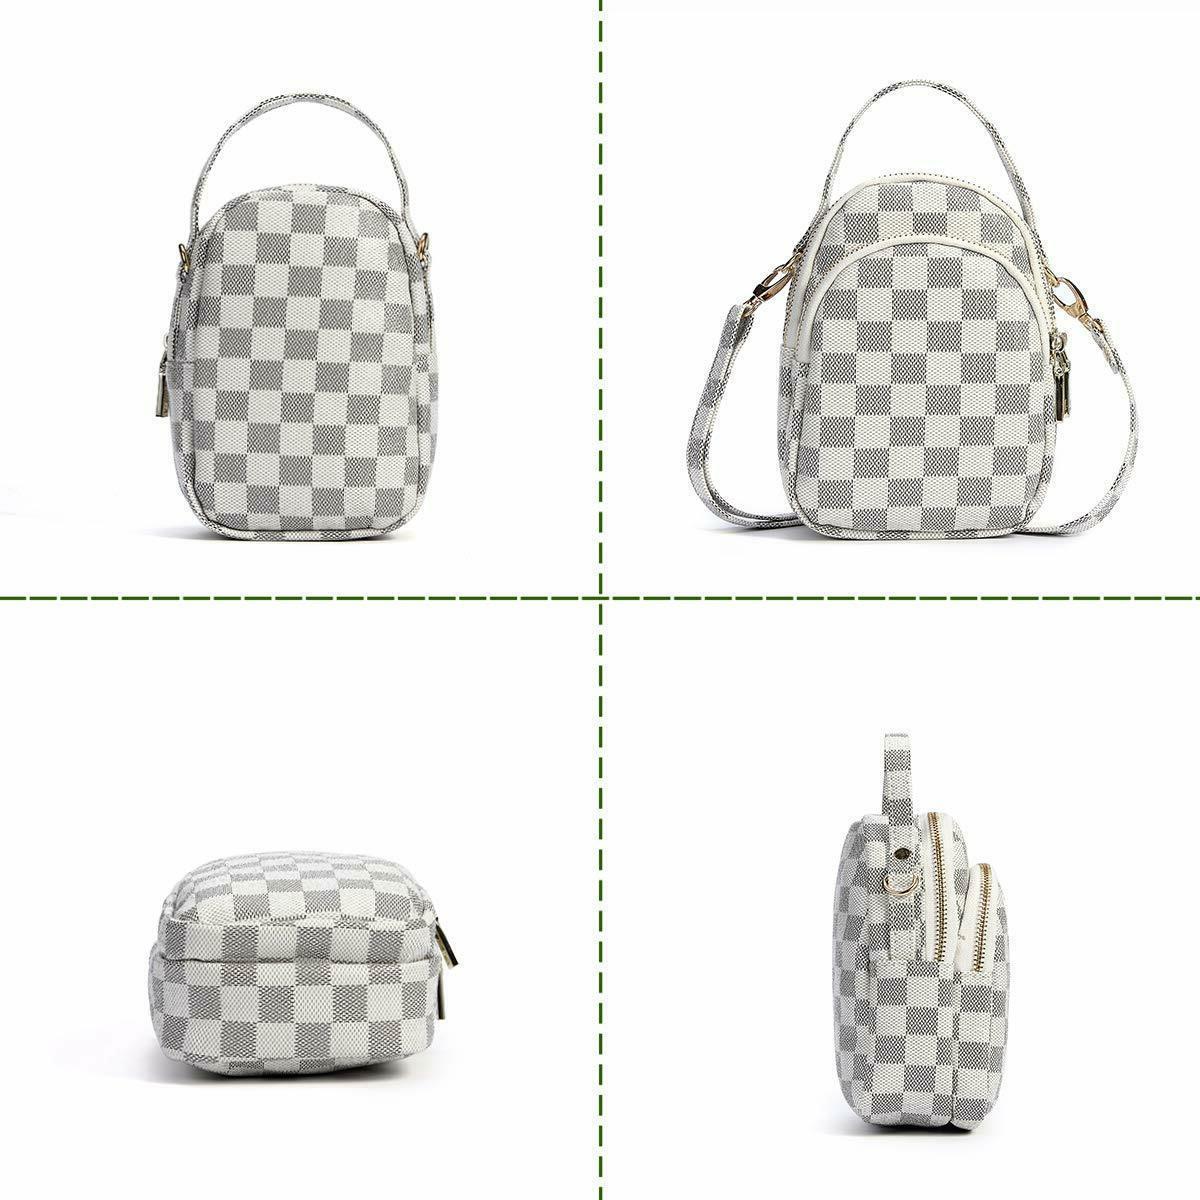 Small Crossbody Bag for Purse